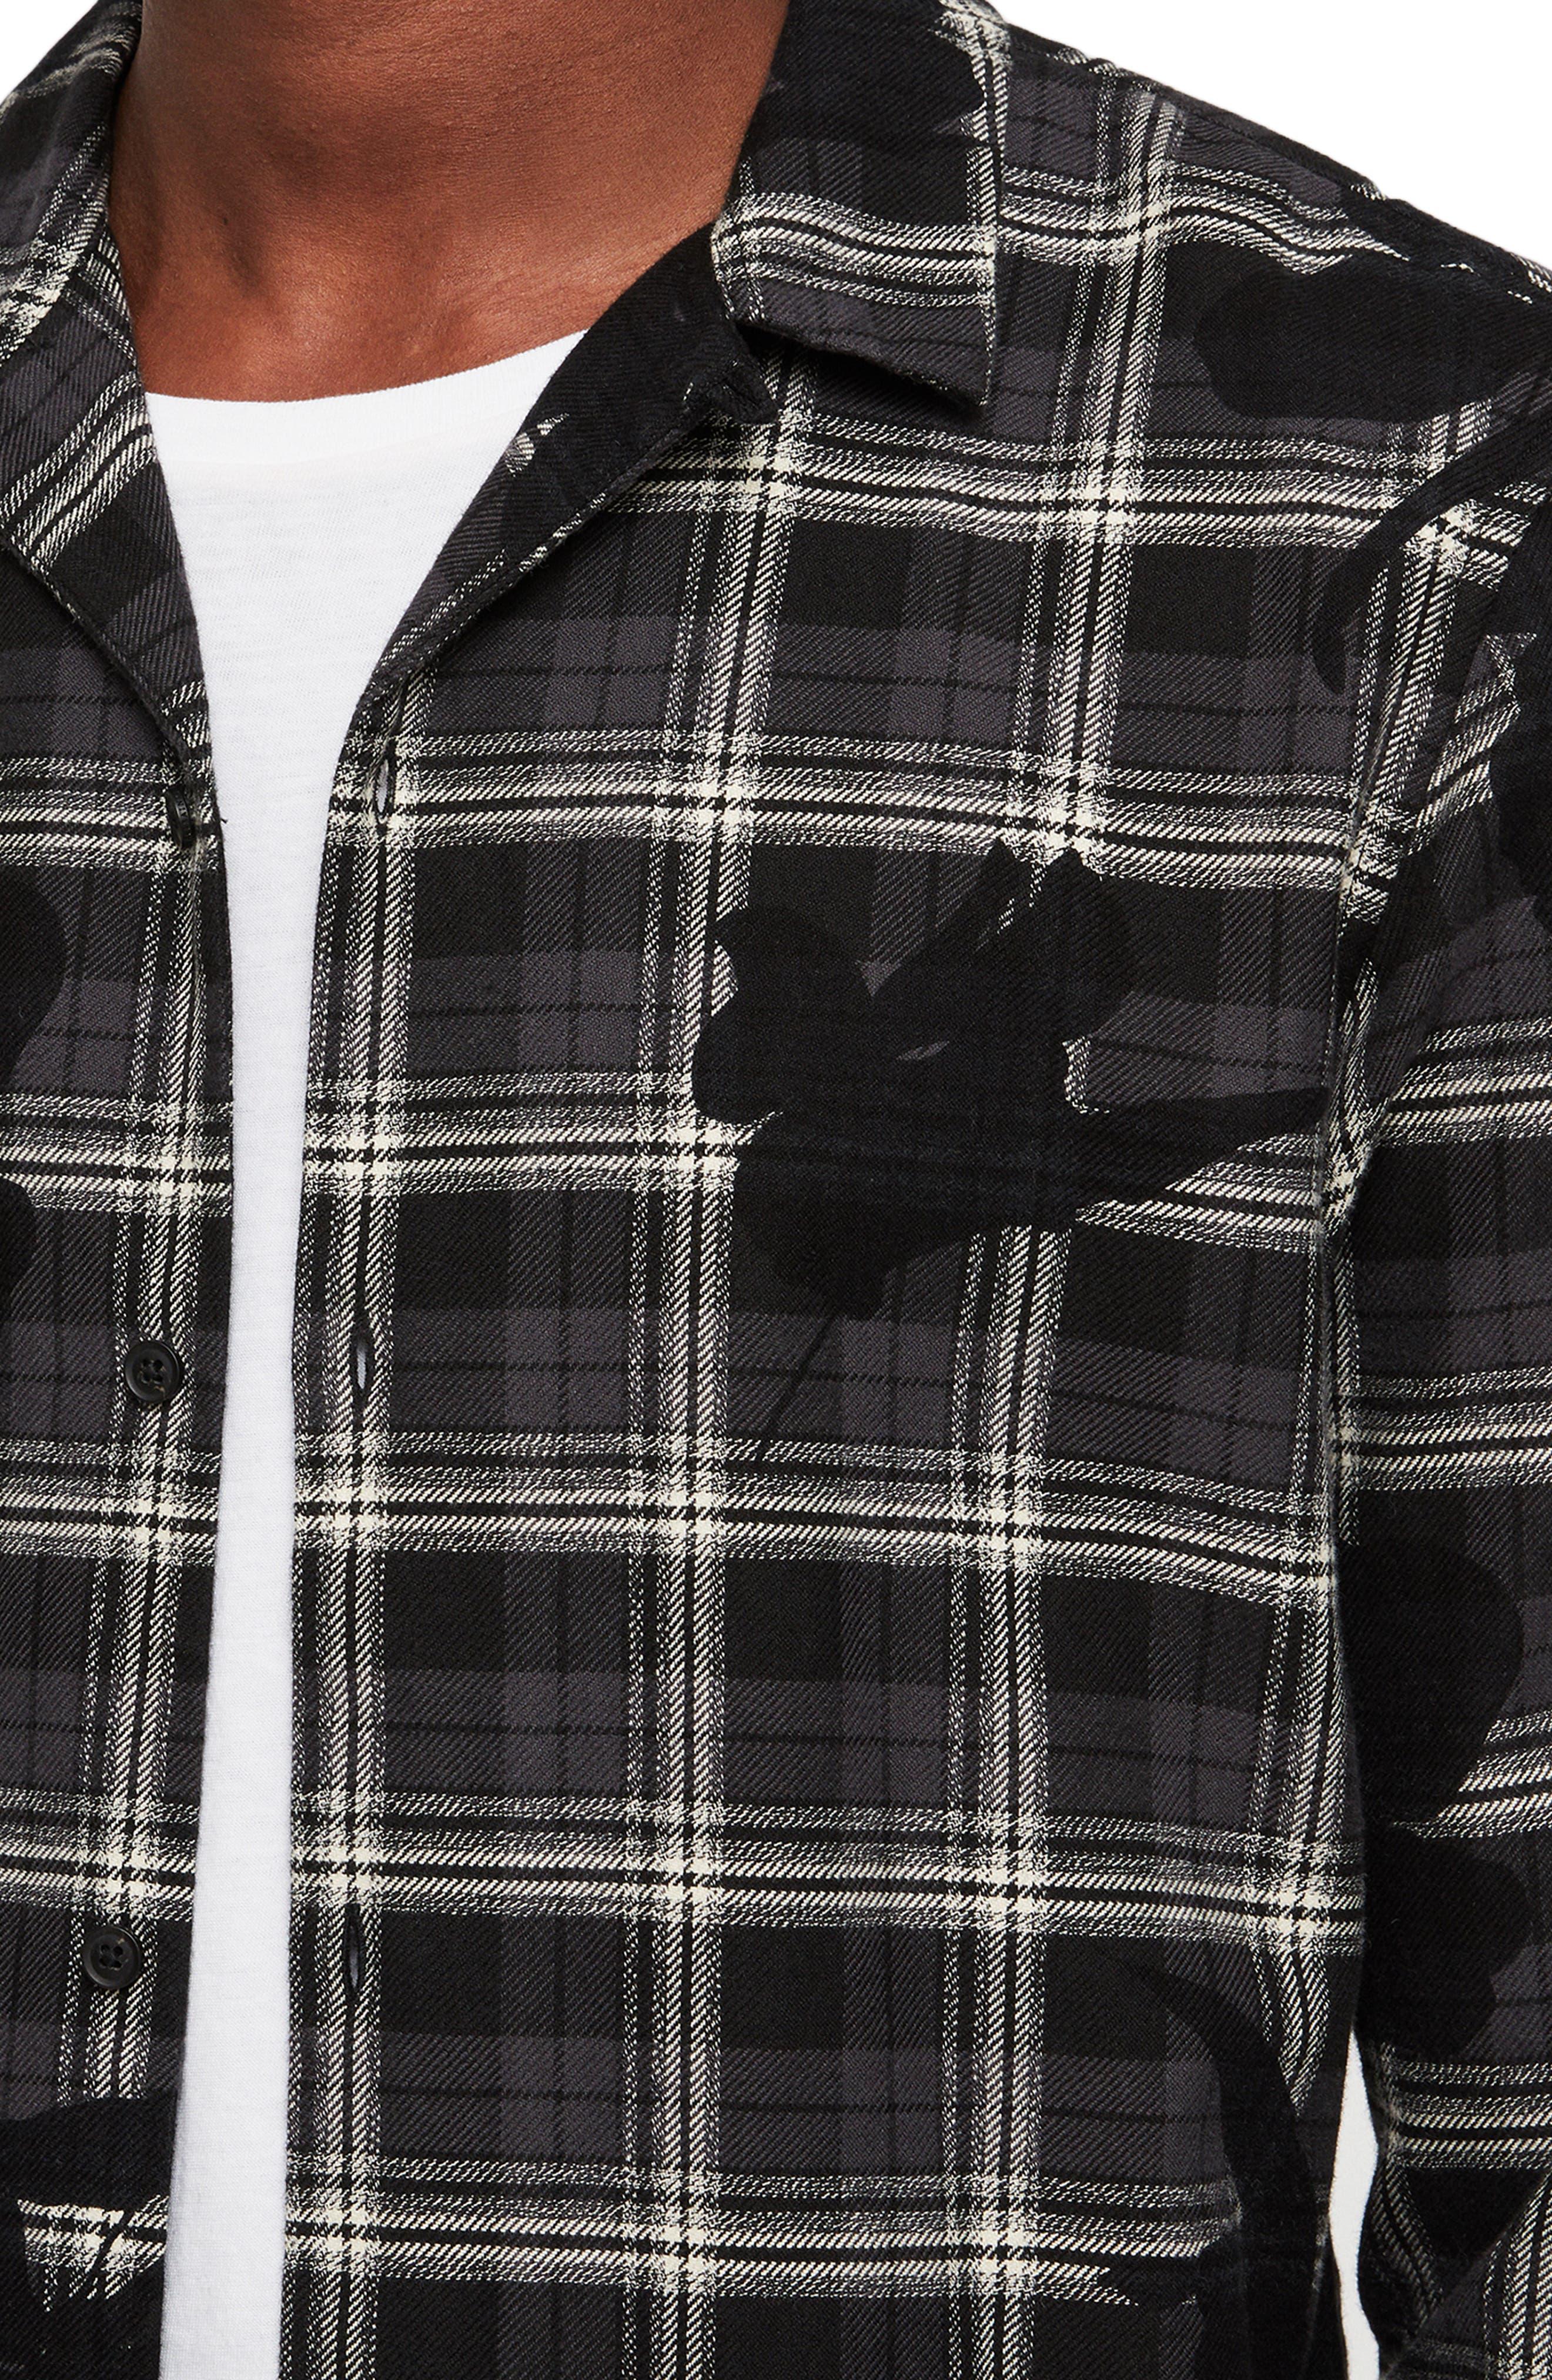 Lilyplaid Slim Fit Flannel Shirt,                             Alternate thumbnail 2, color,                             001